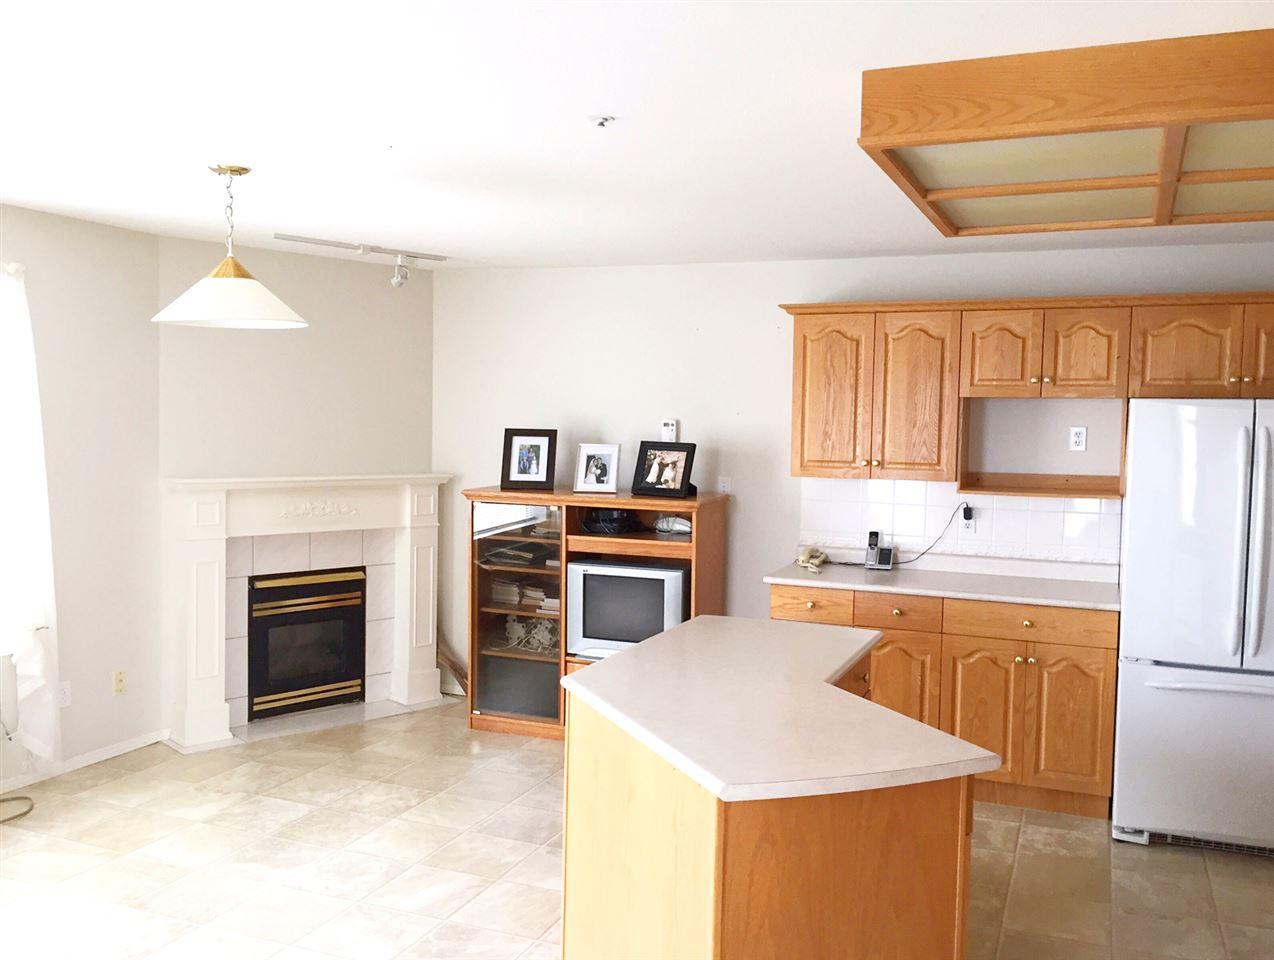 Condo Apartment at 303 2626 COUNTESS STREET, Unit 303, Abbotsford, British Columbia. Image 3